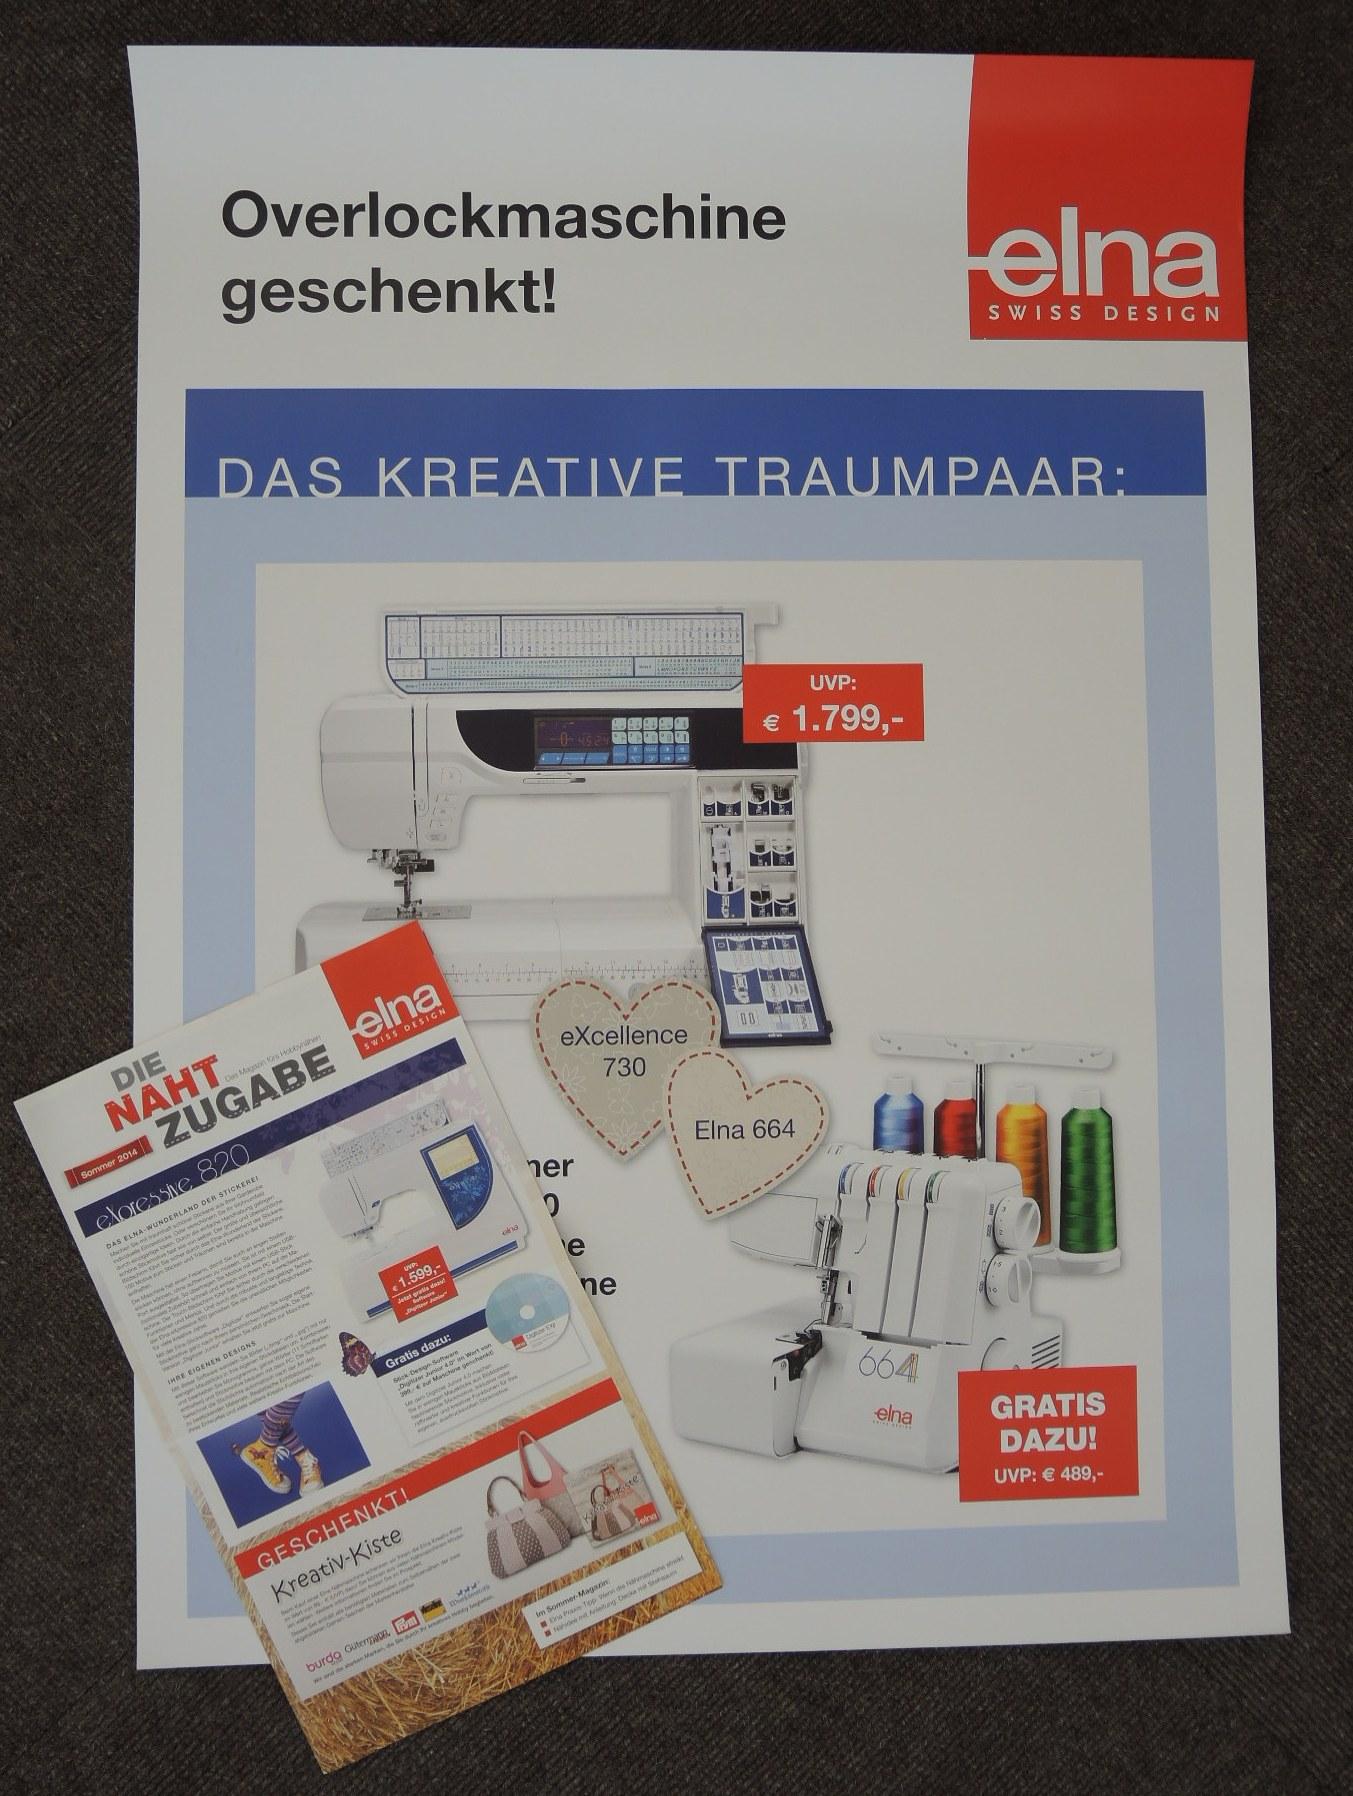 Elna Plakat, Bild ULLA